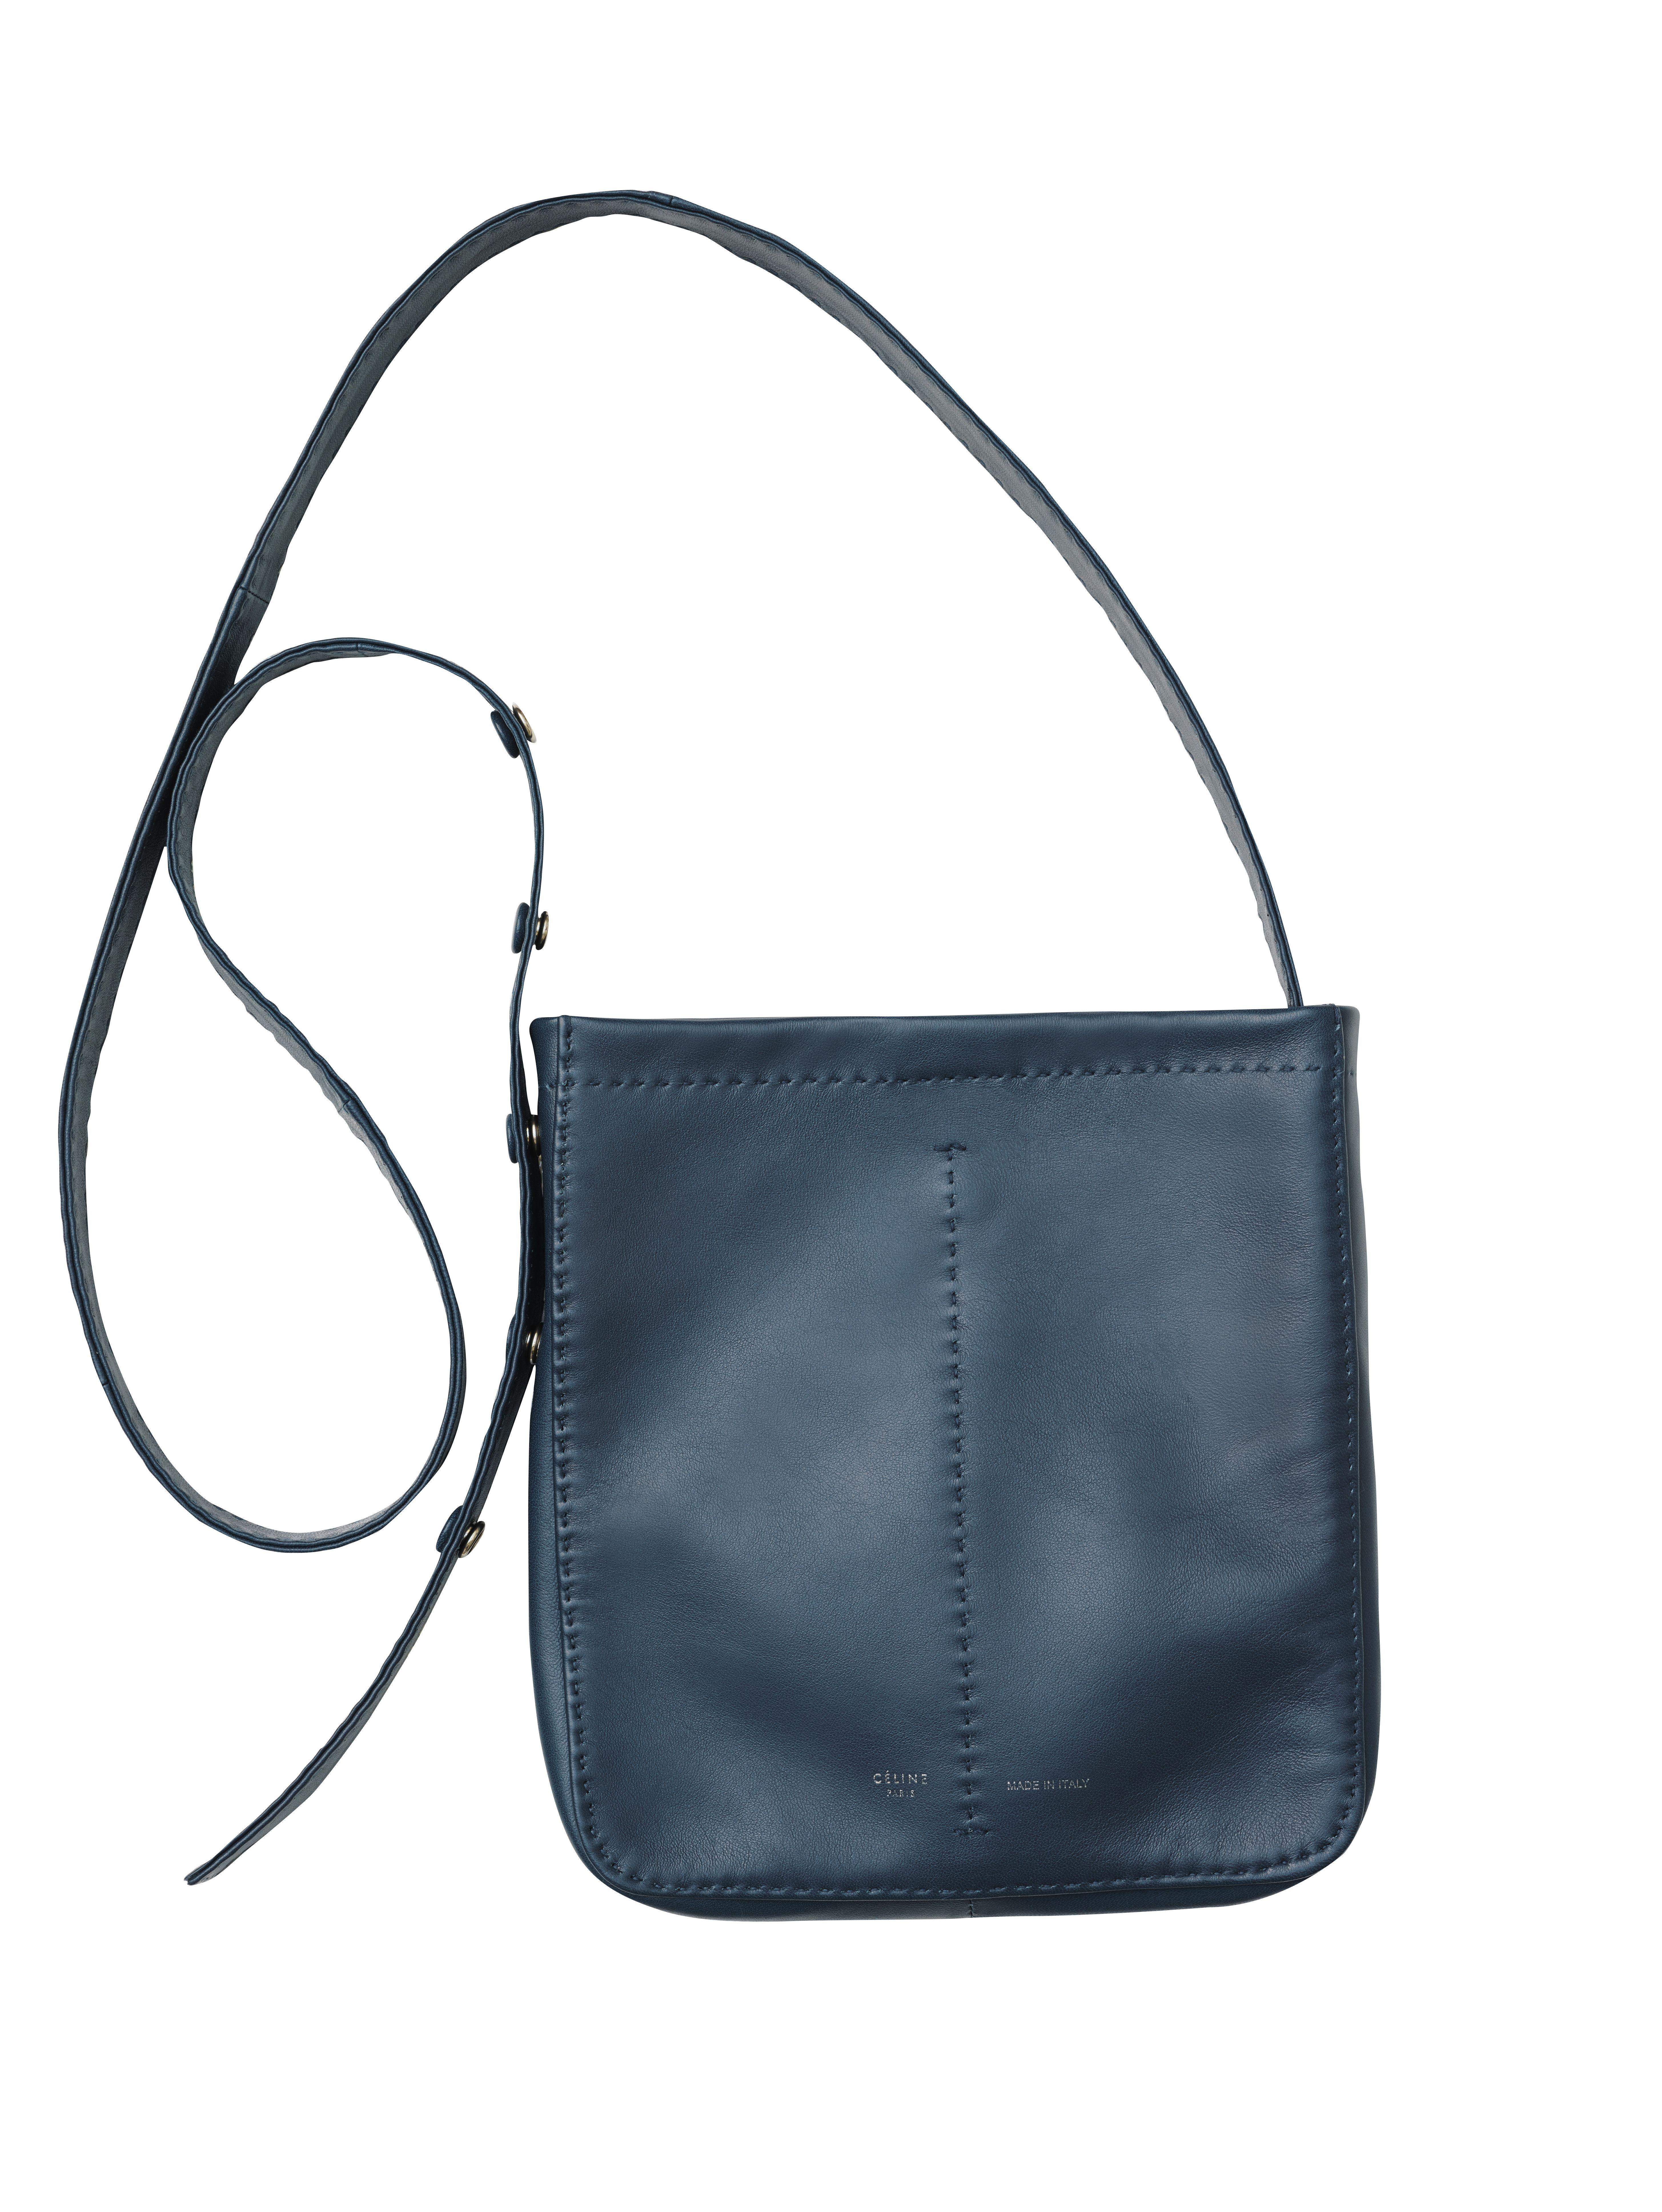 Collezioni Accessori n°85  Céline , Masculine, Lookbook  AW16 17  bag   fashion  style  mood  glamour  romantic 69c123b6ce7